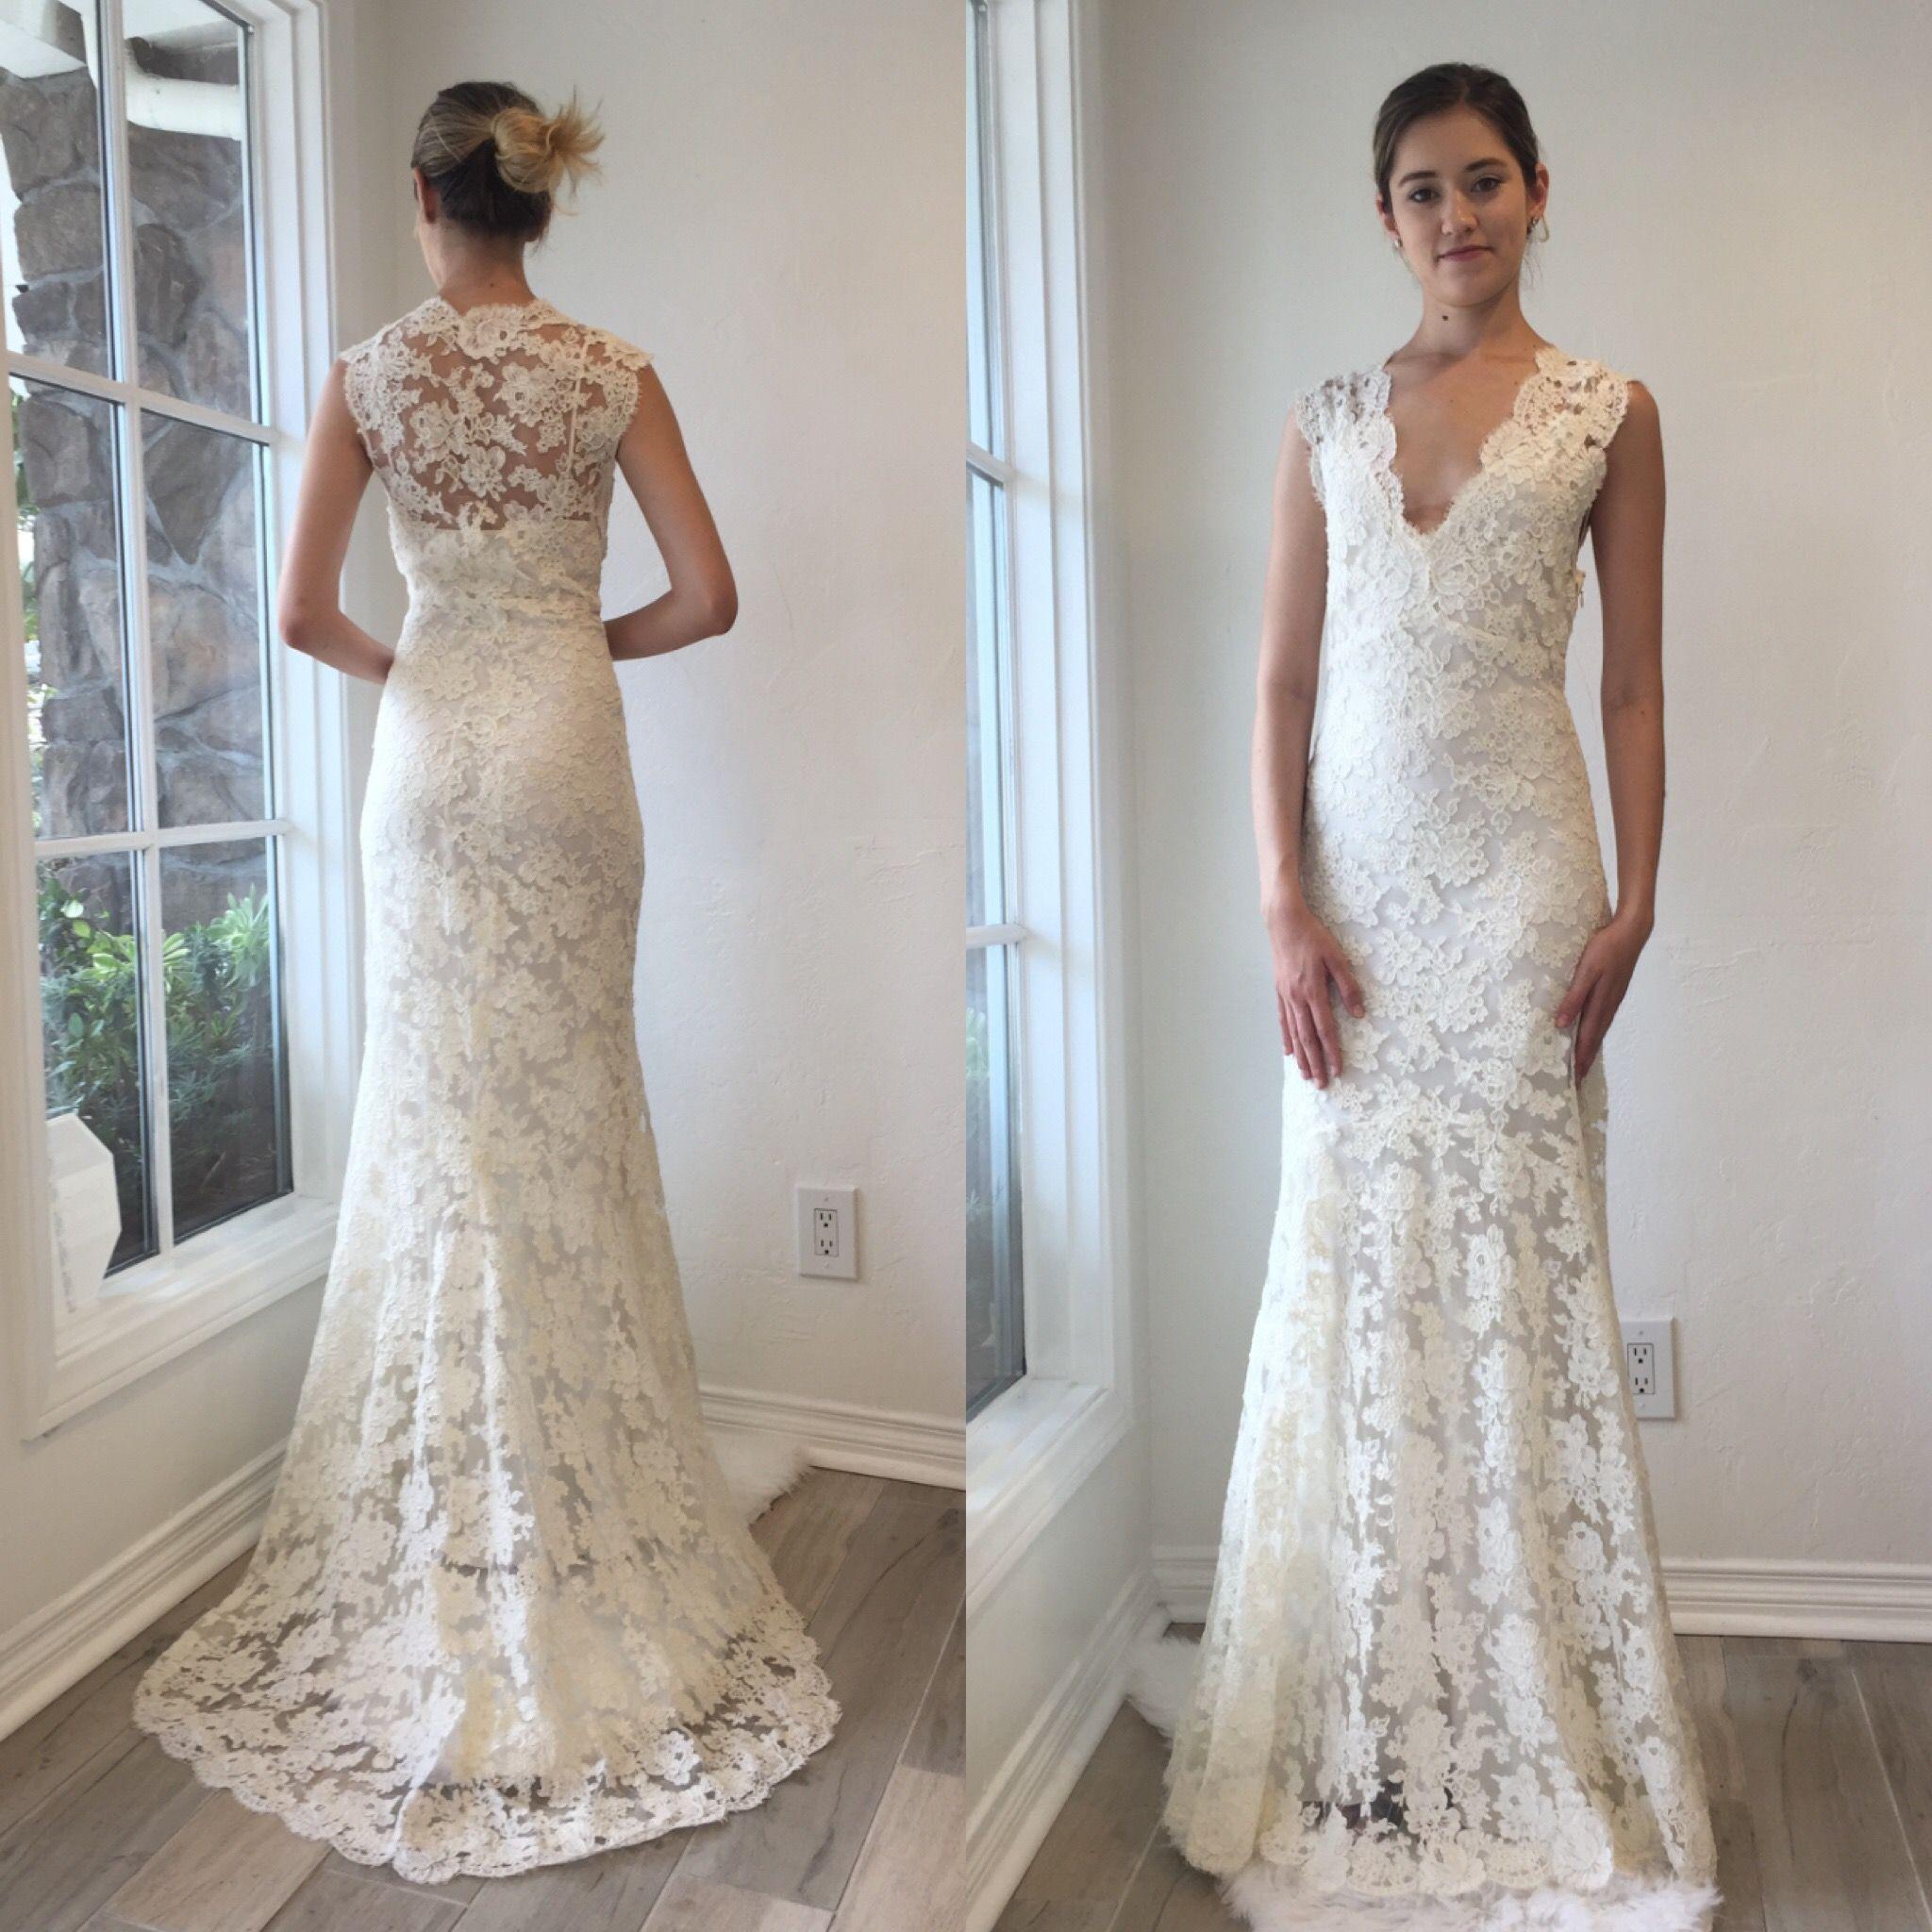 Monique Lhuillier Spring 2020 Masterpiece Silk Ball Gown With Drop Waist Magnolia E Monique Lhuillier Wedding Wedding Dresses Lace Monique Lhuillier Bridal